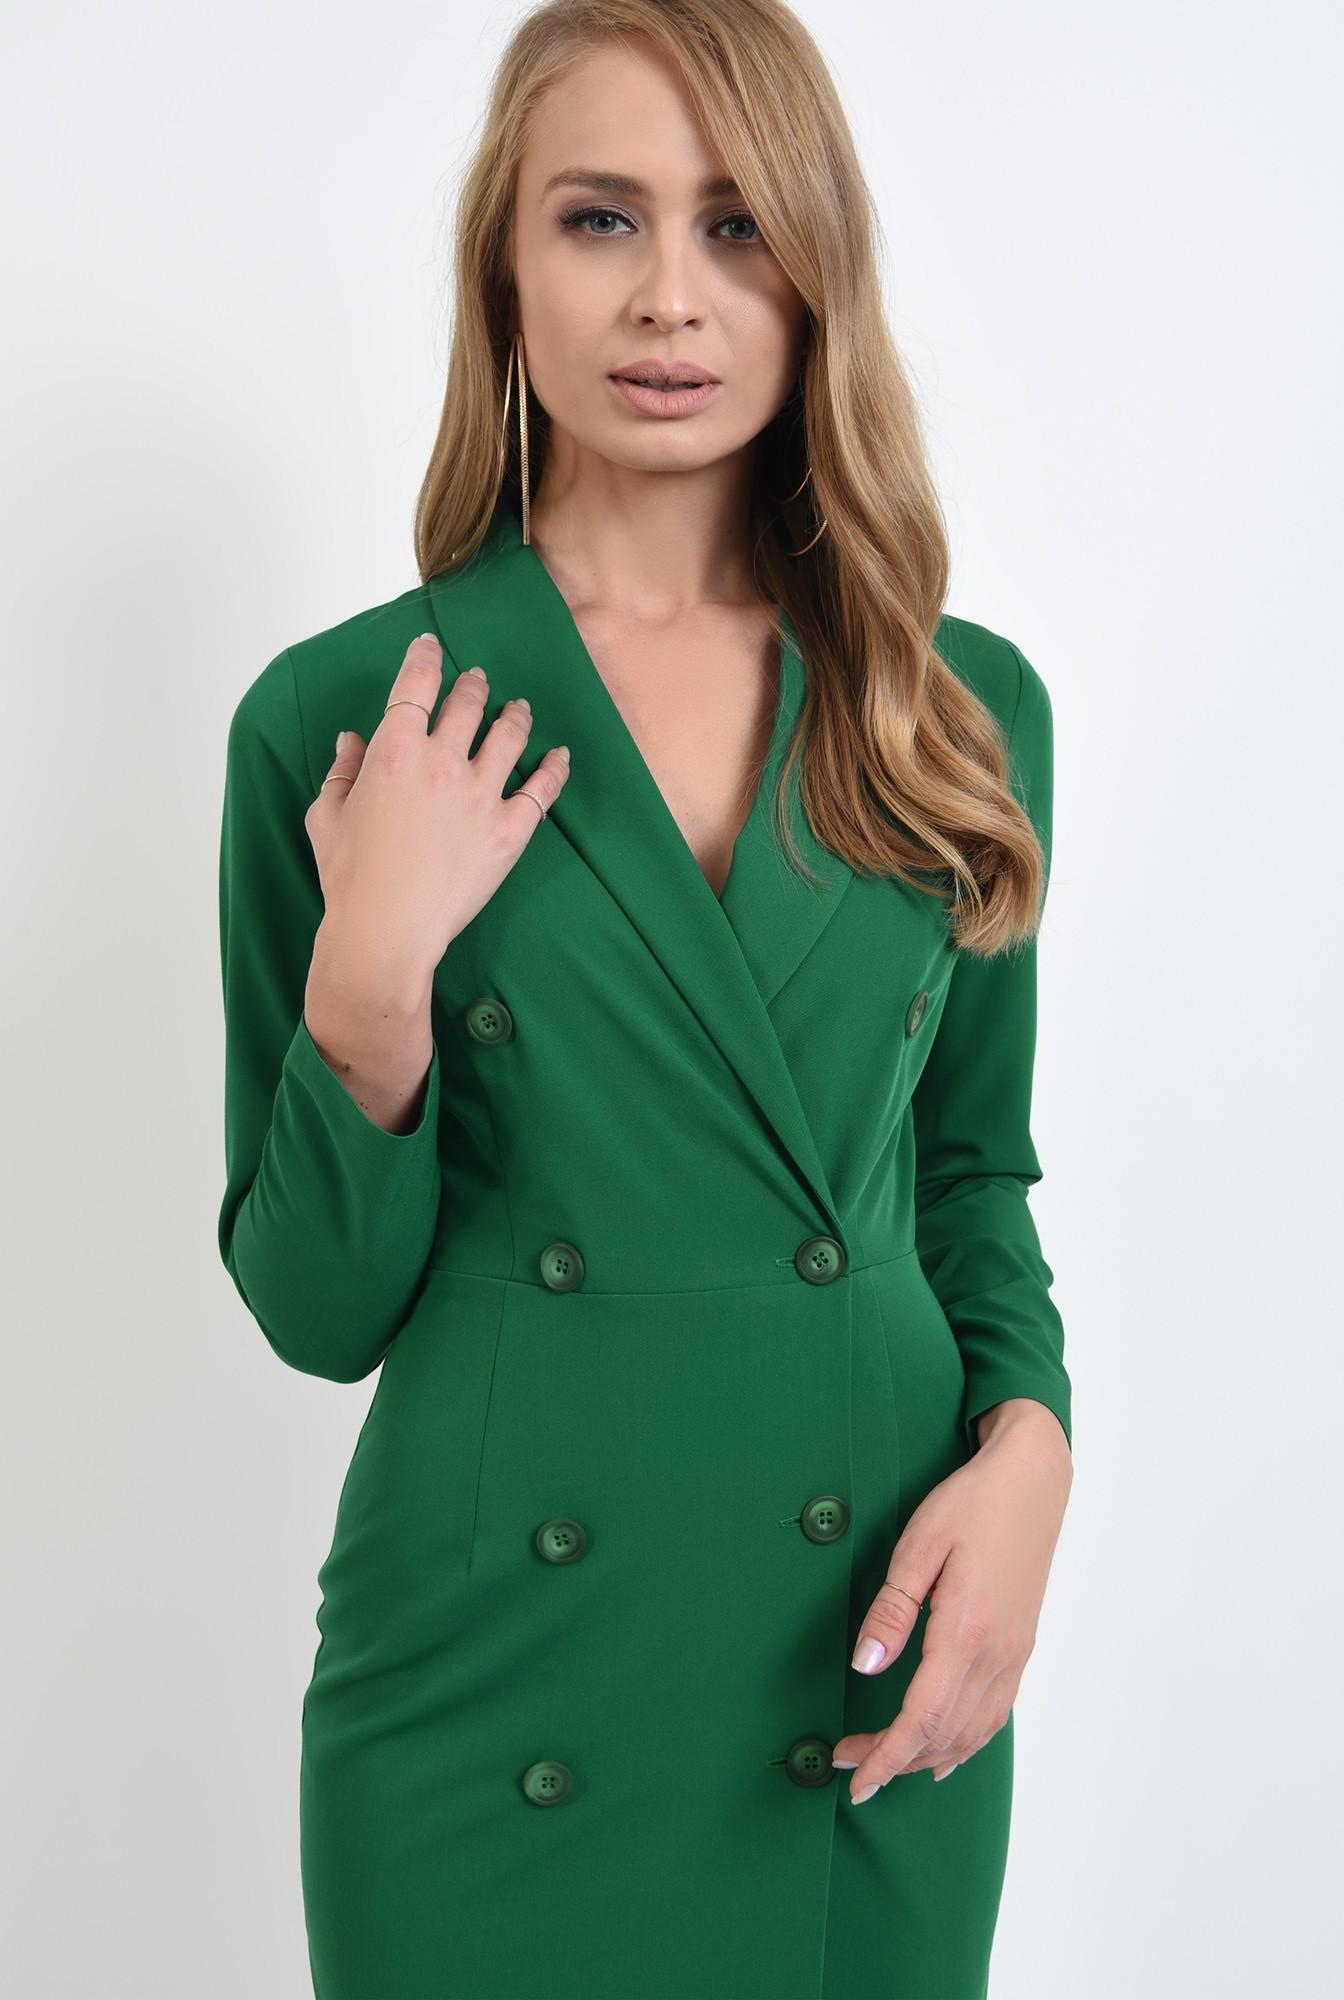 2 - 360 - rochie midi, verde, tip sacou